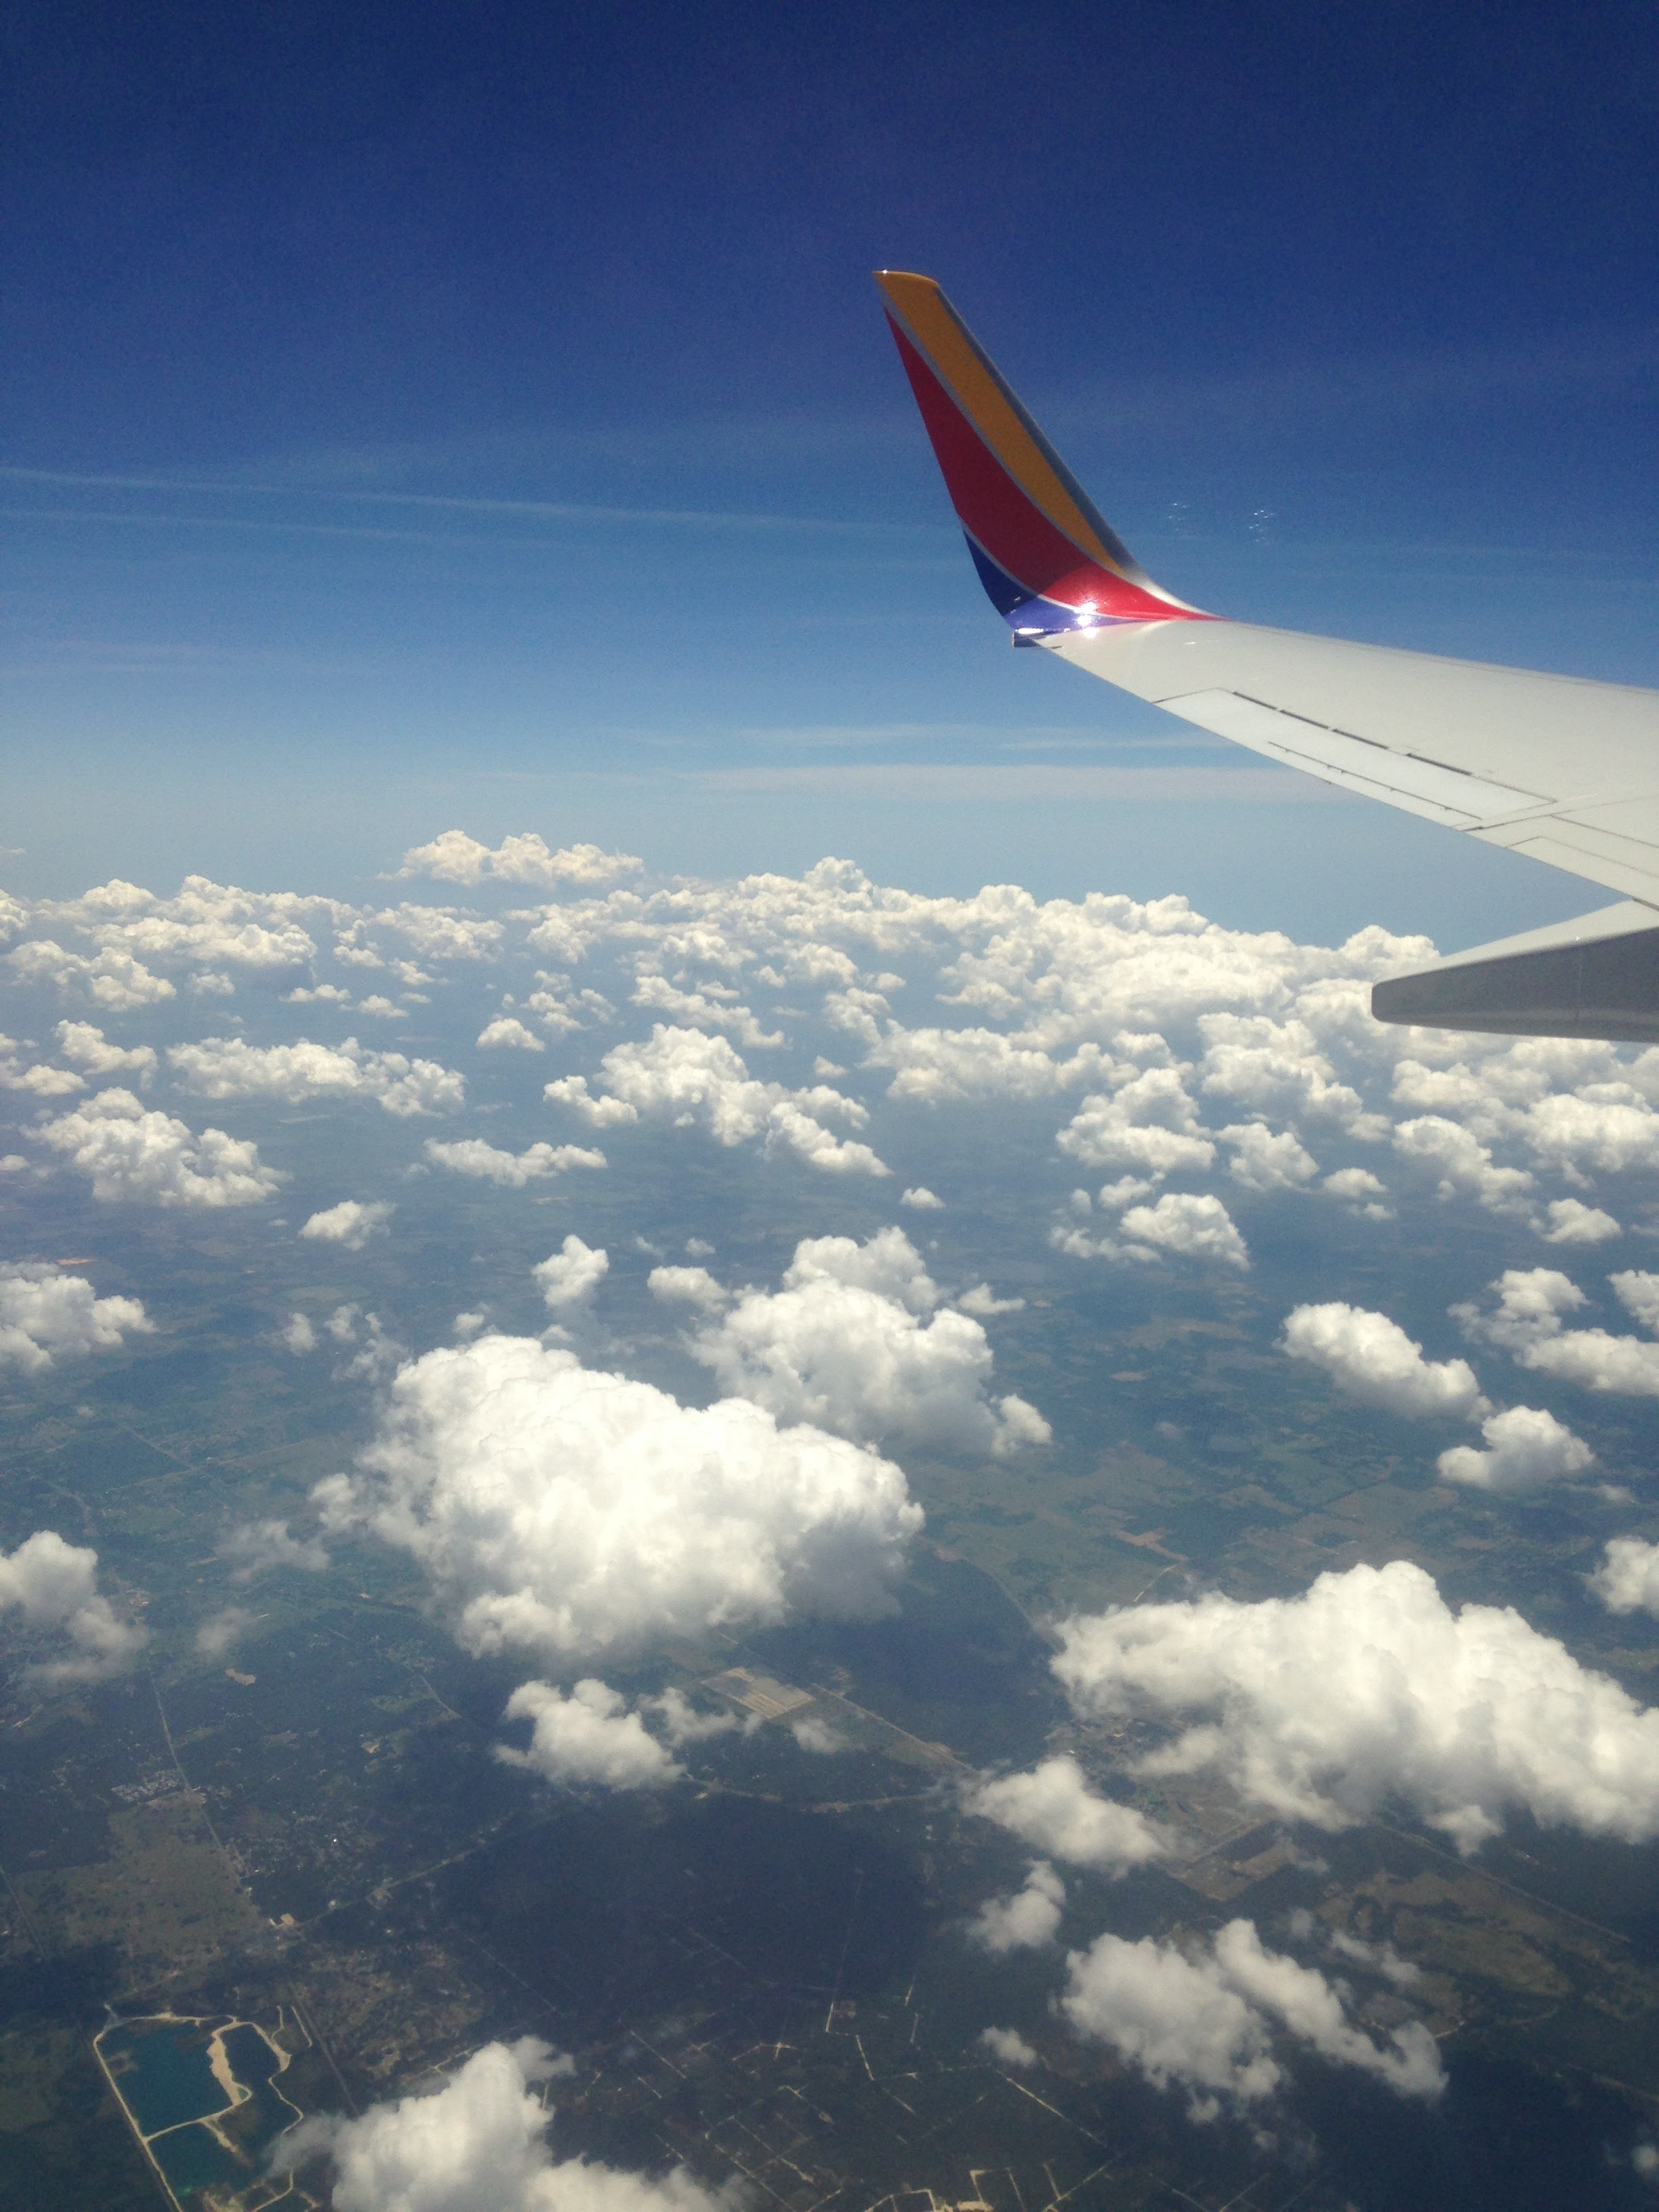 Plane-and-Sky.jpg